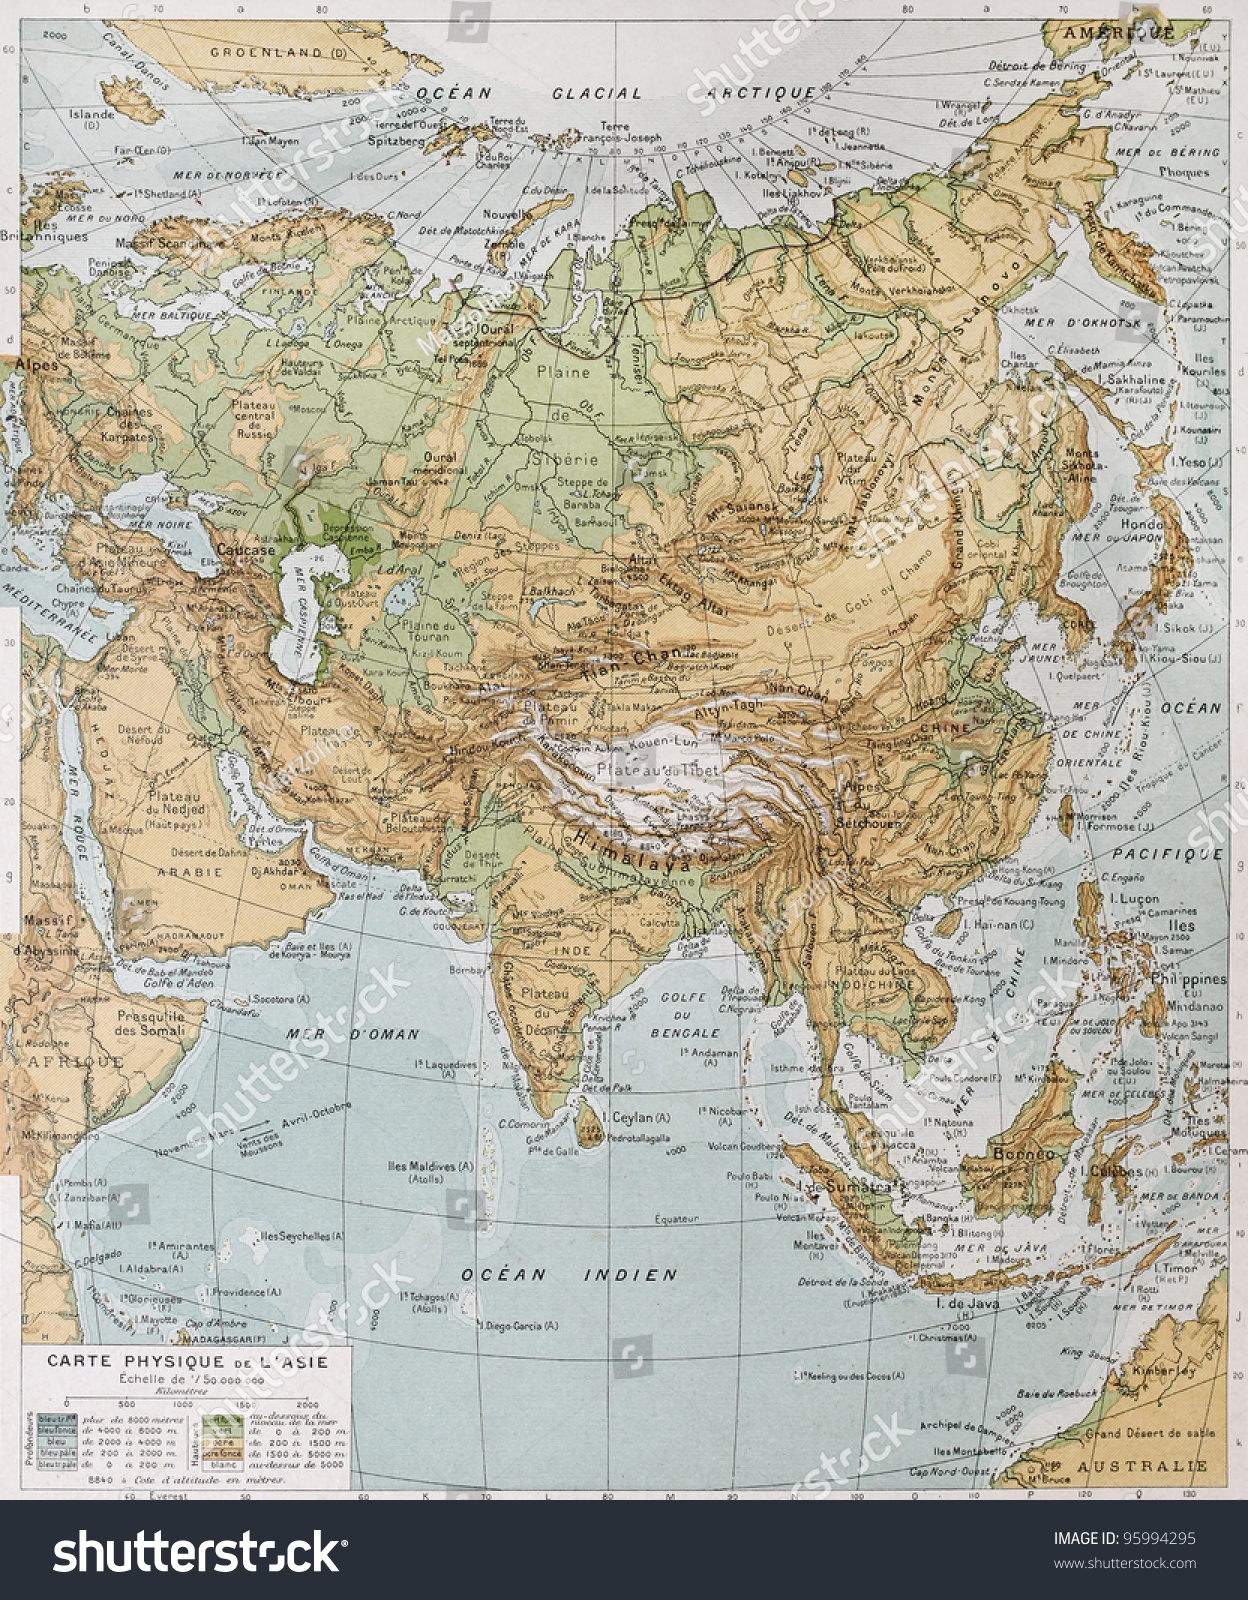 Bilge Tonyukuk Enstitusu Asia Physical Map